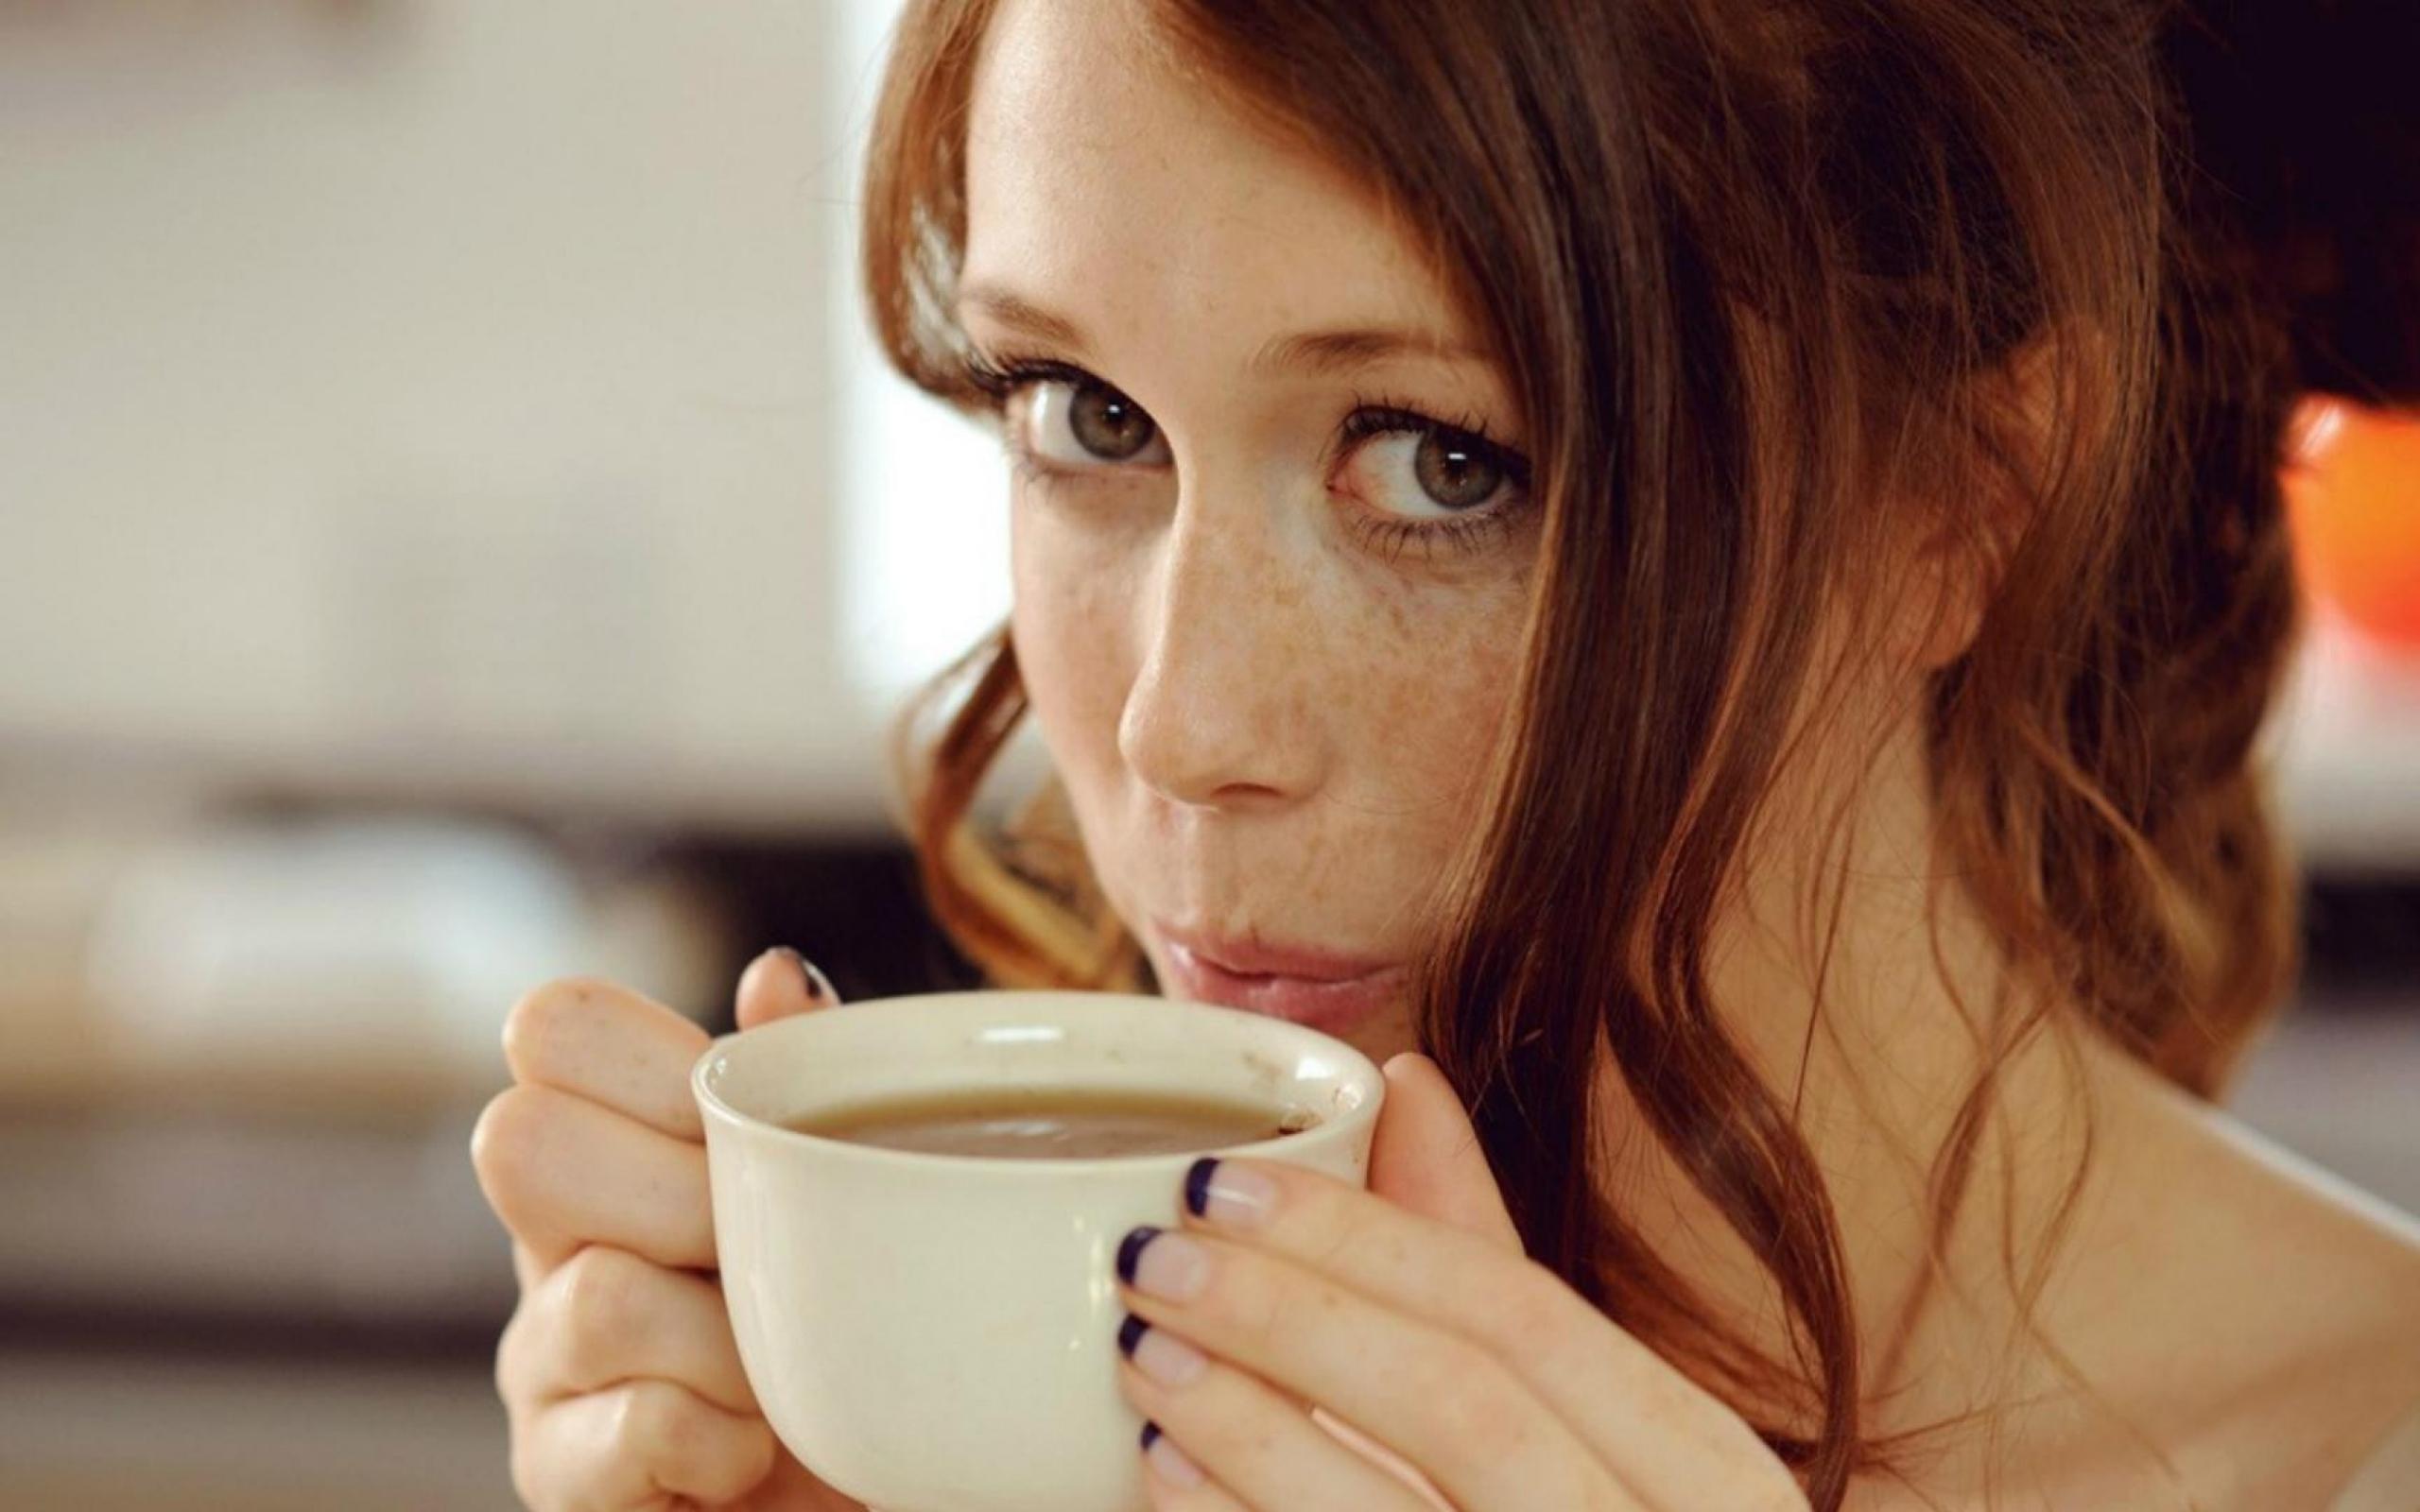 www-getbg-net_girls_girl_with_freckles_drinking_coffee_084005_